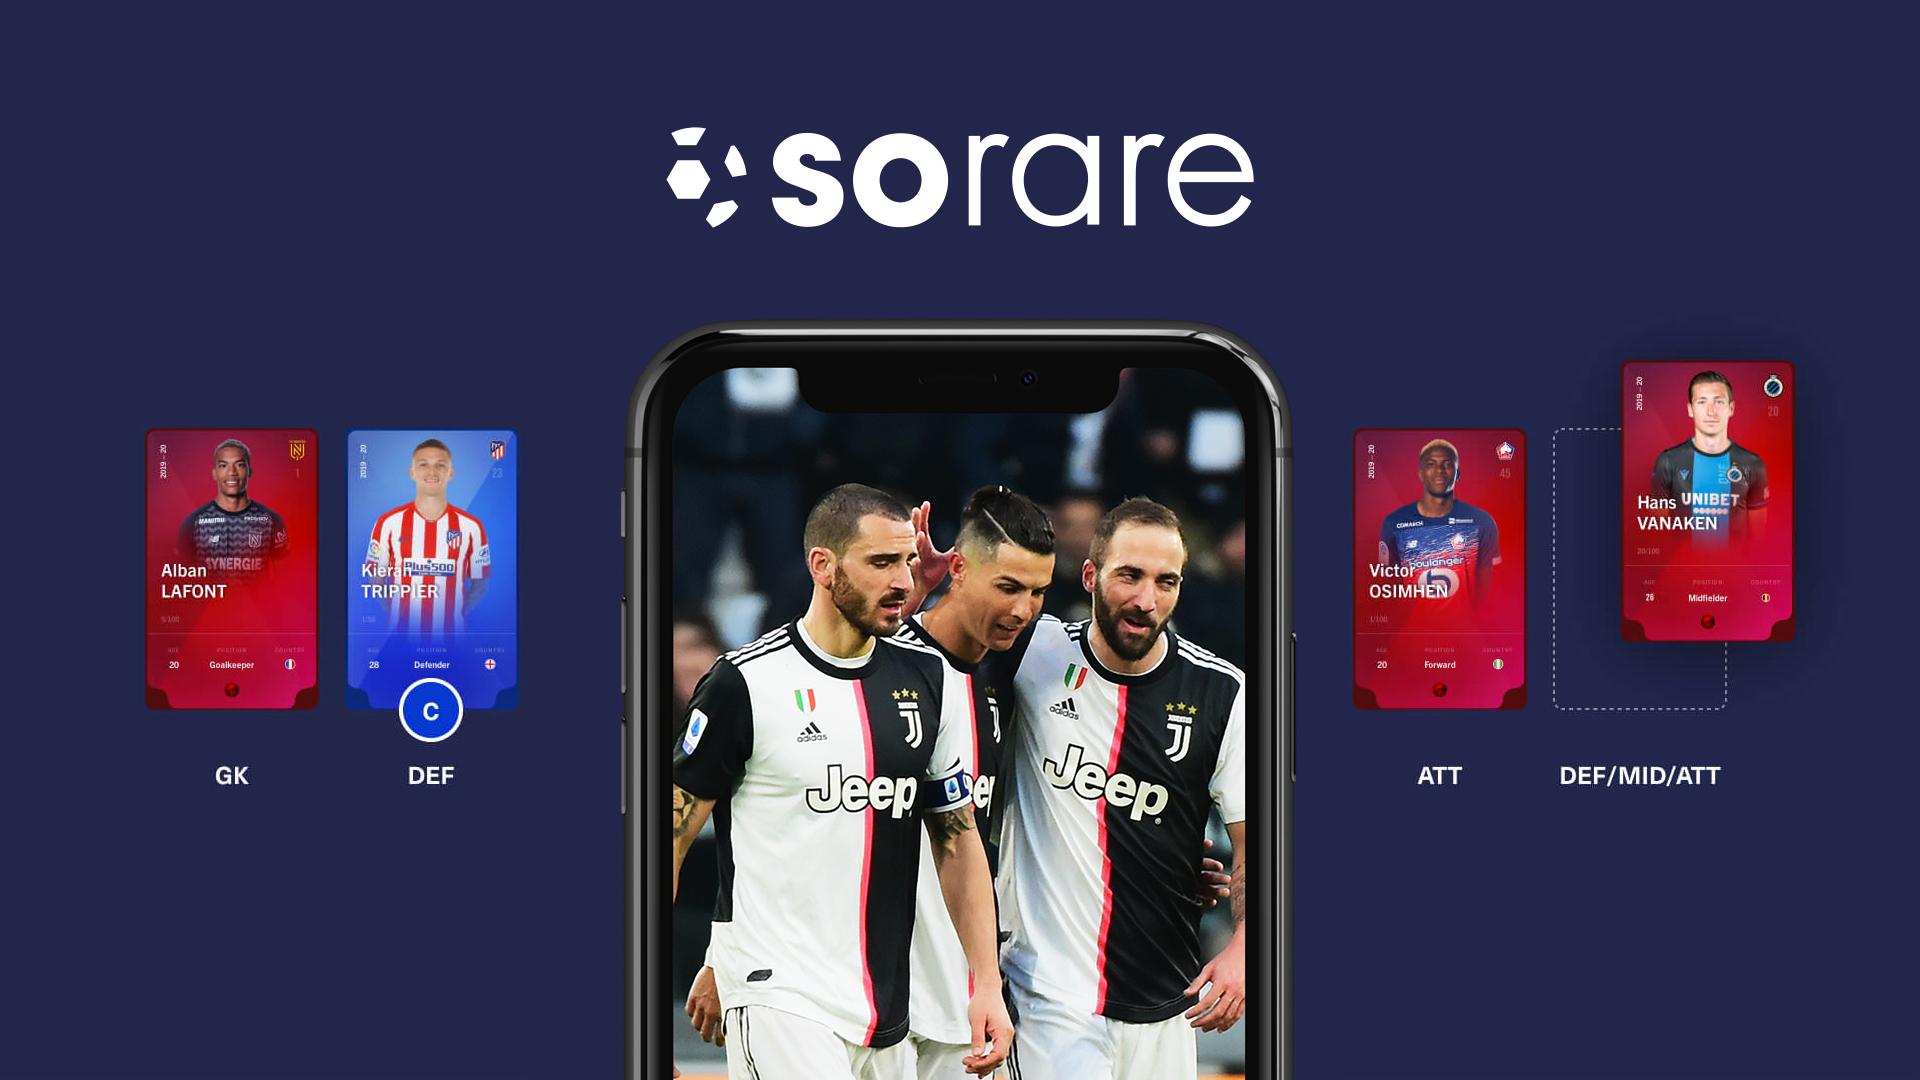 Fantasy soccer NFT platform Sorare scores $680 million raise led by SoftBank